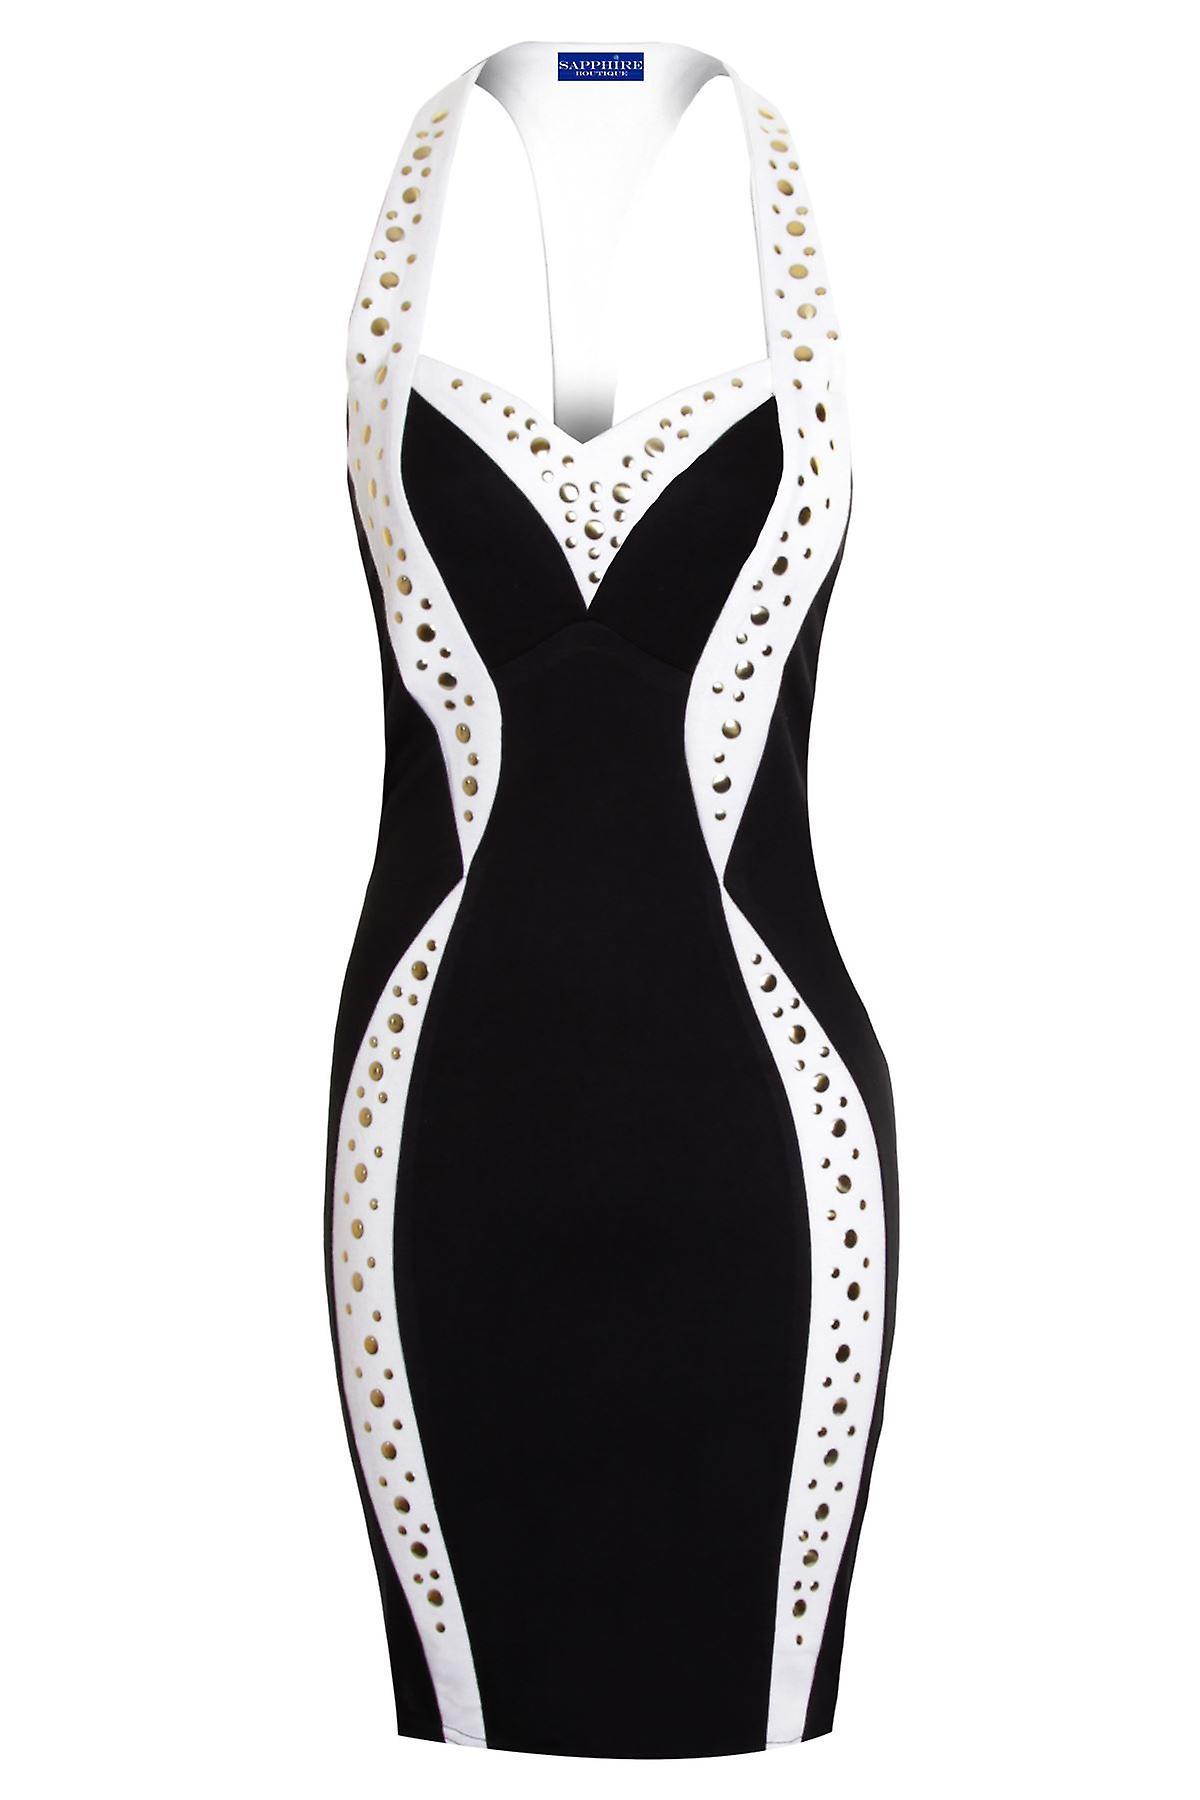 Ladies Celeb Black White Slim Effect Gold Studded Stretch Bodycon Women's Dress